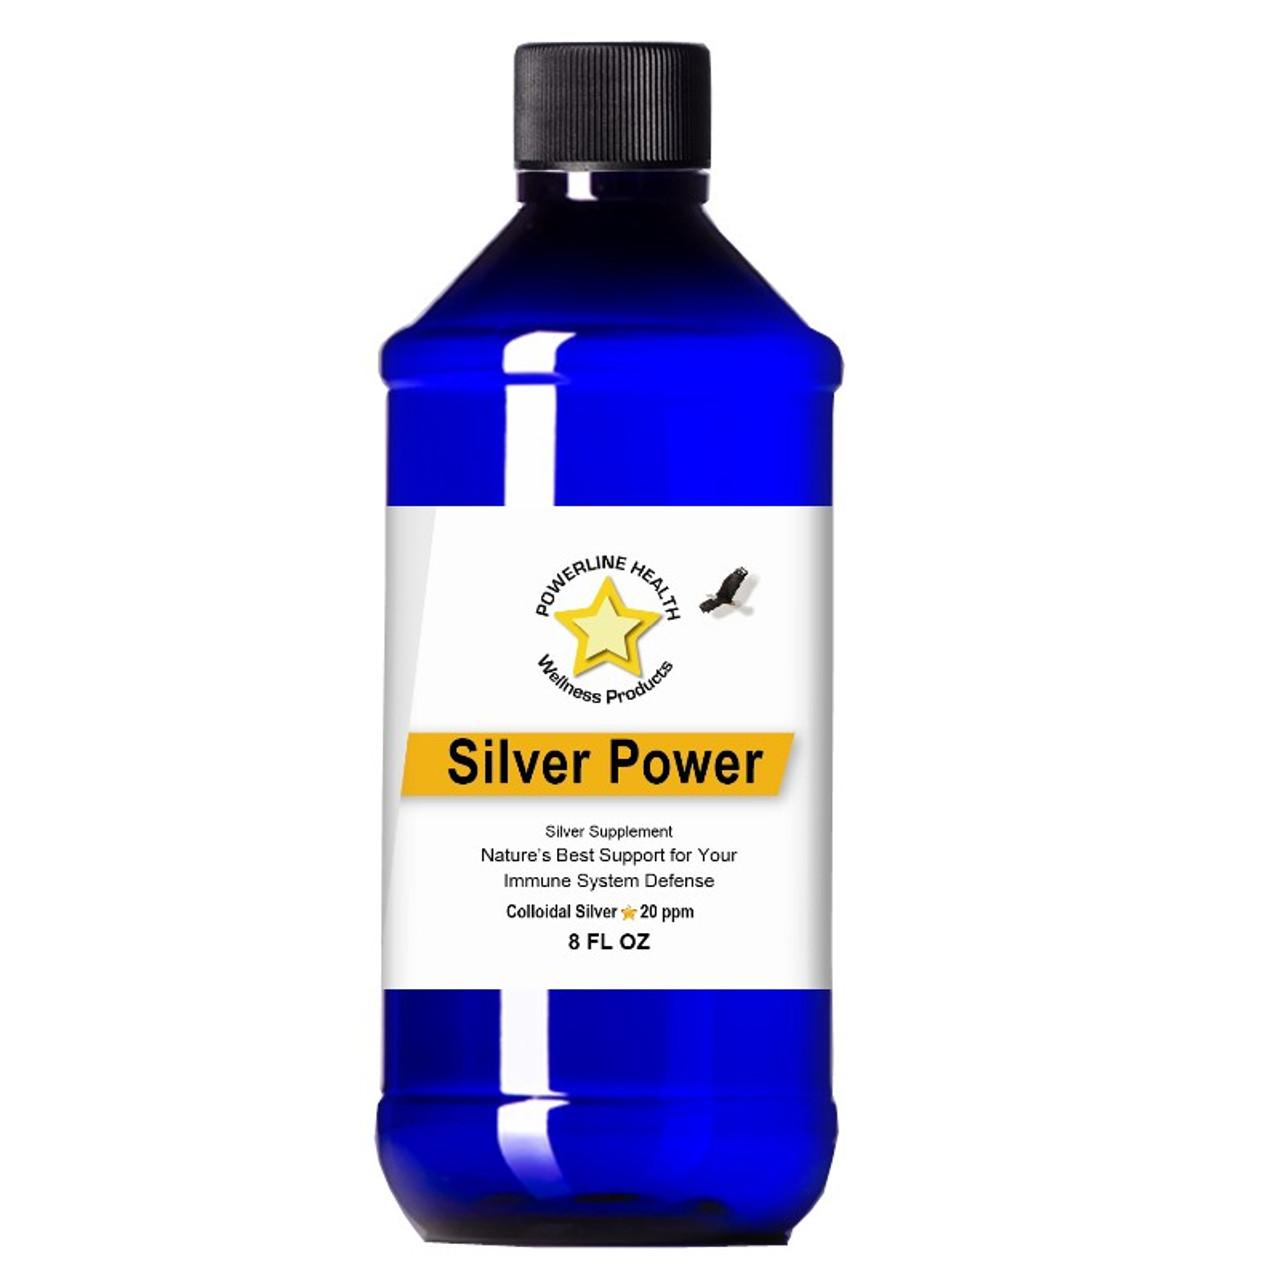 Silver Power - 20 PPM Colloidal Silver